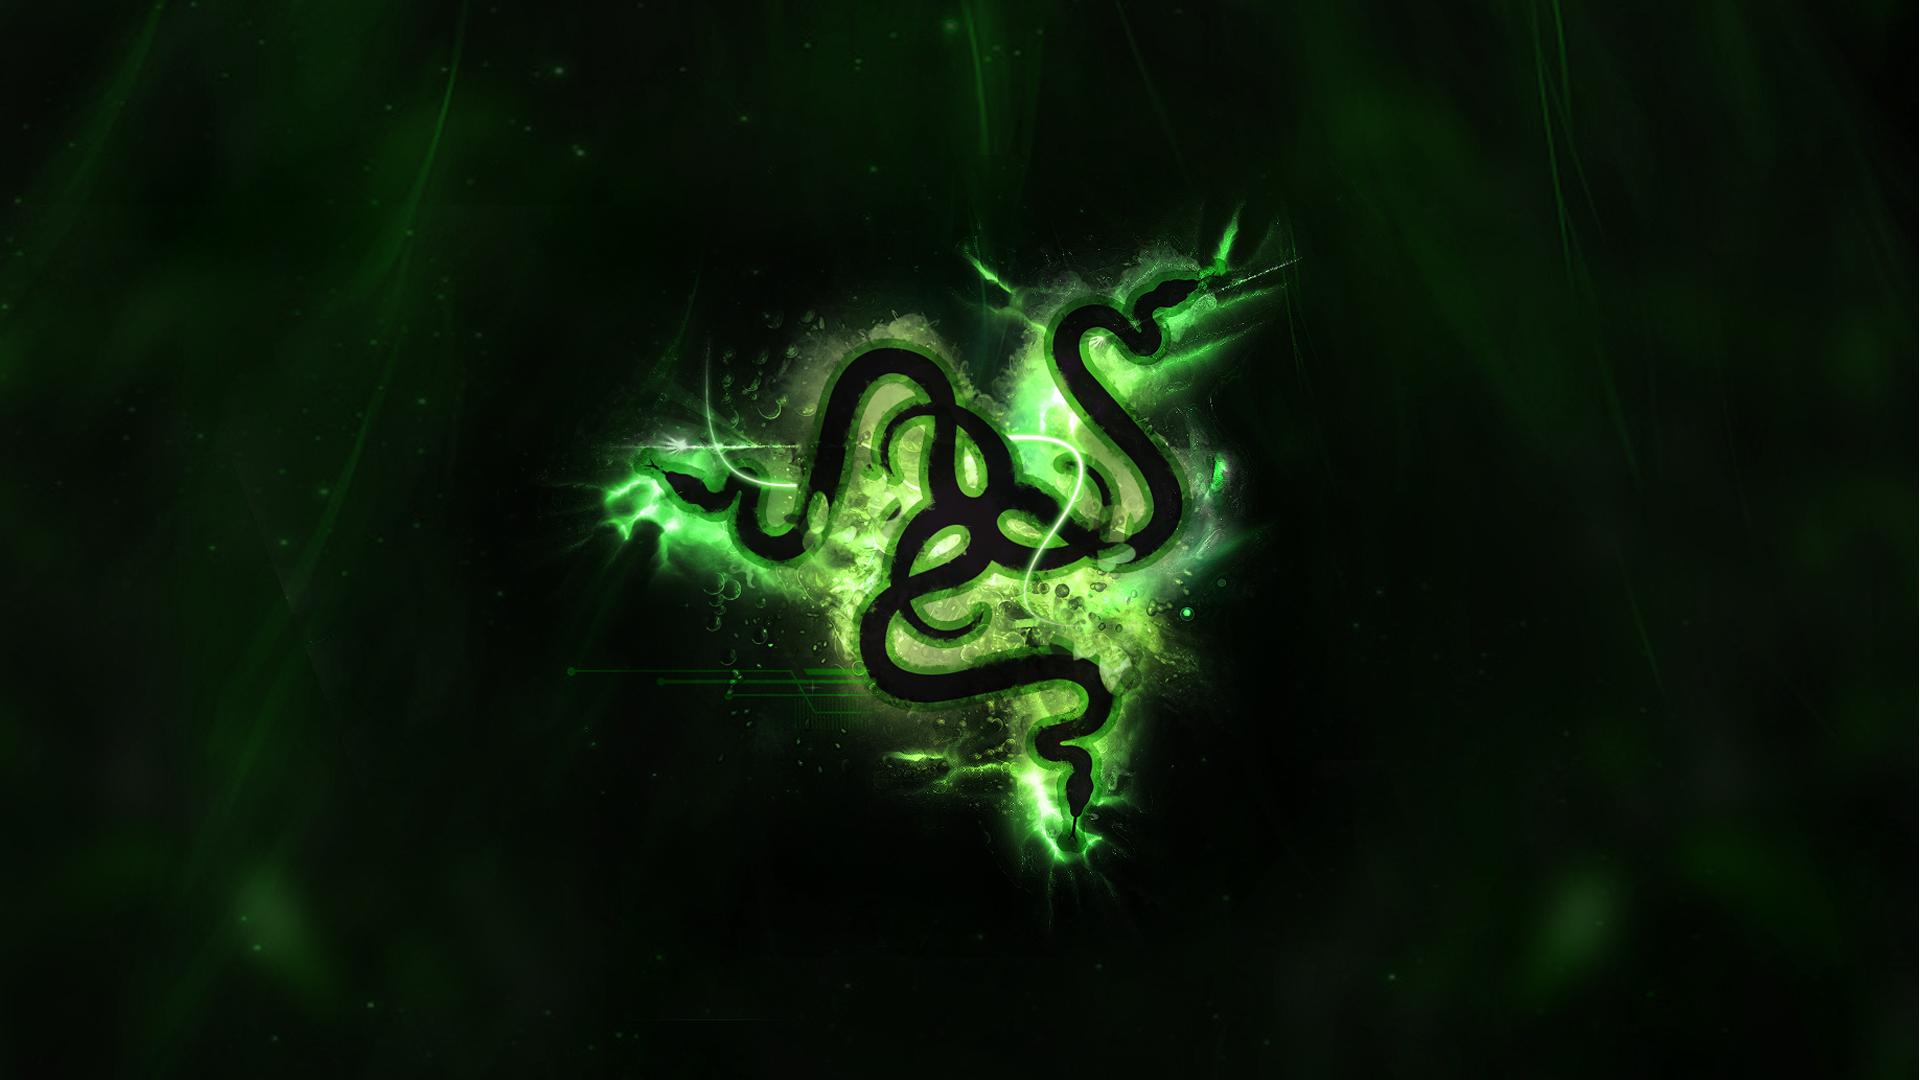 змея наклейка фон без смс